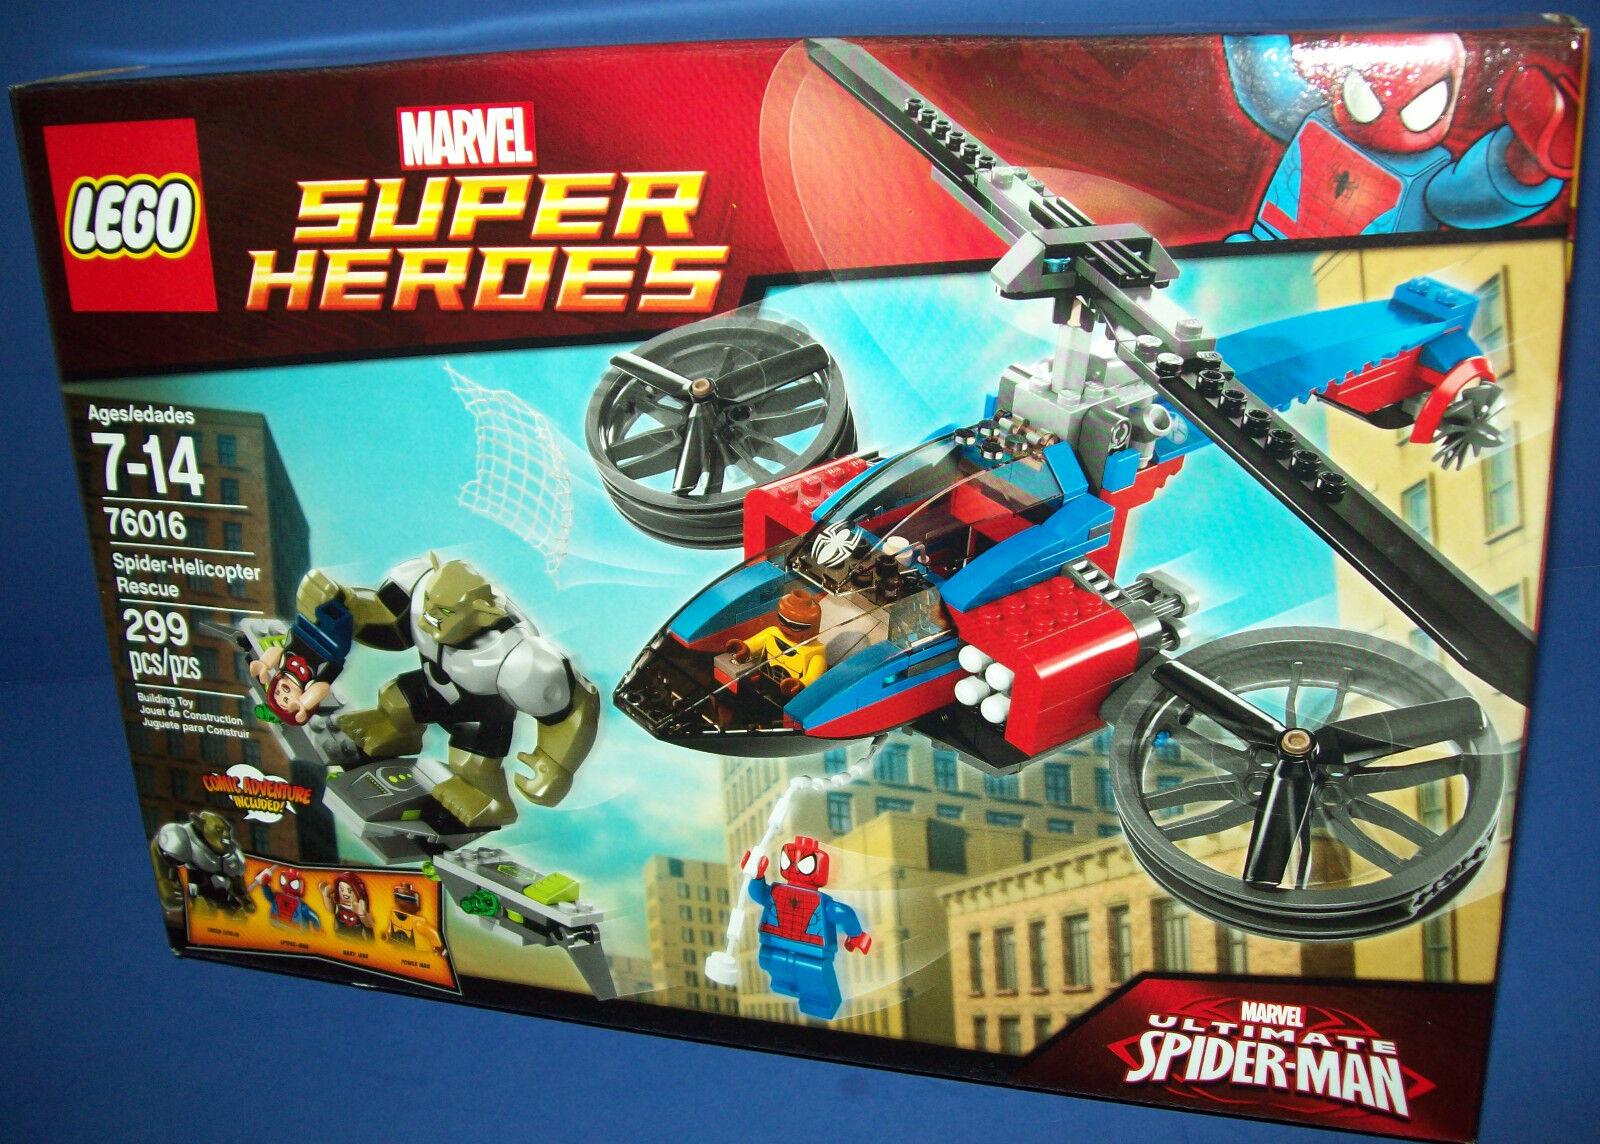 LEGO 76016 Spider-Helicopter Rescue Factory Sealed RETIROT Marvel Super Heroes